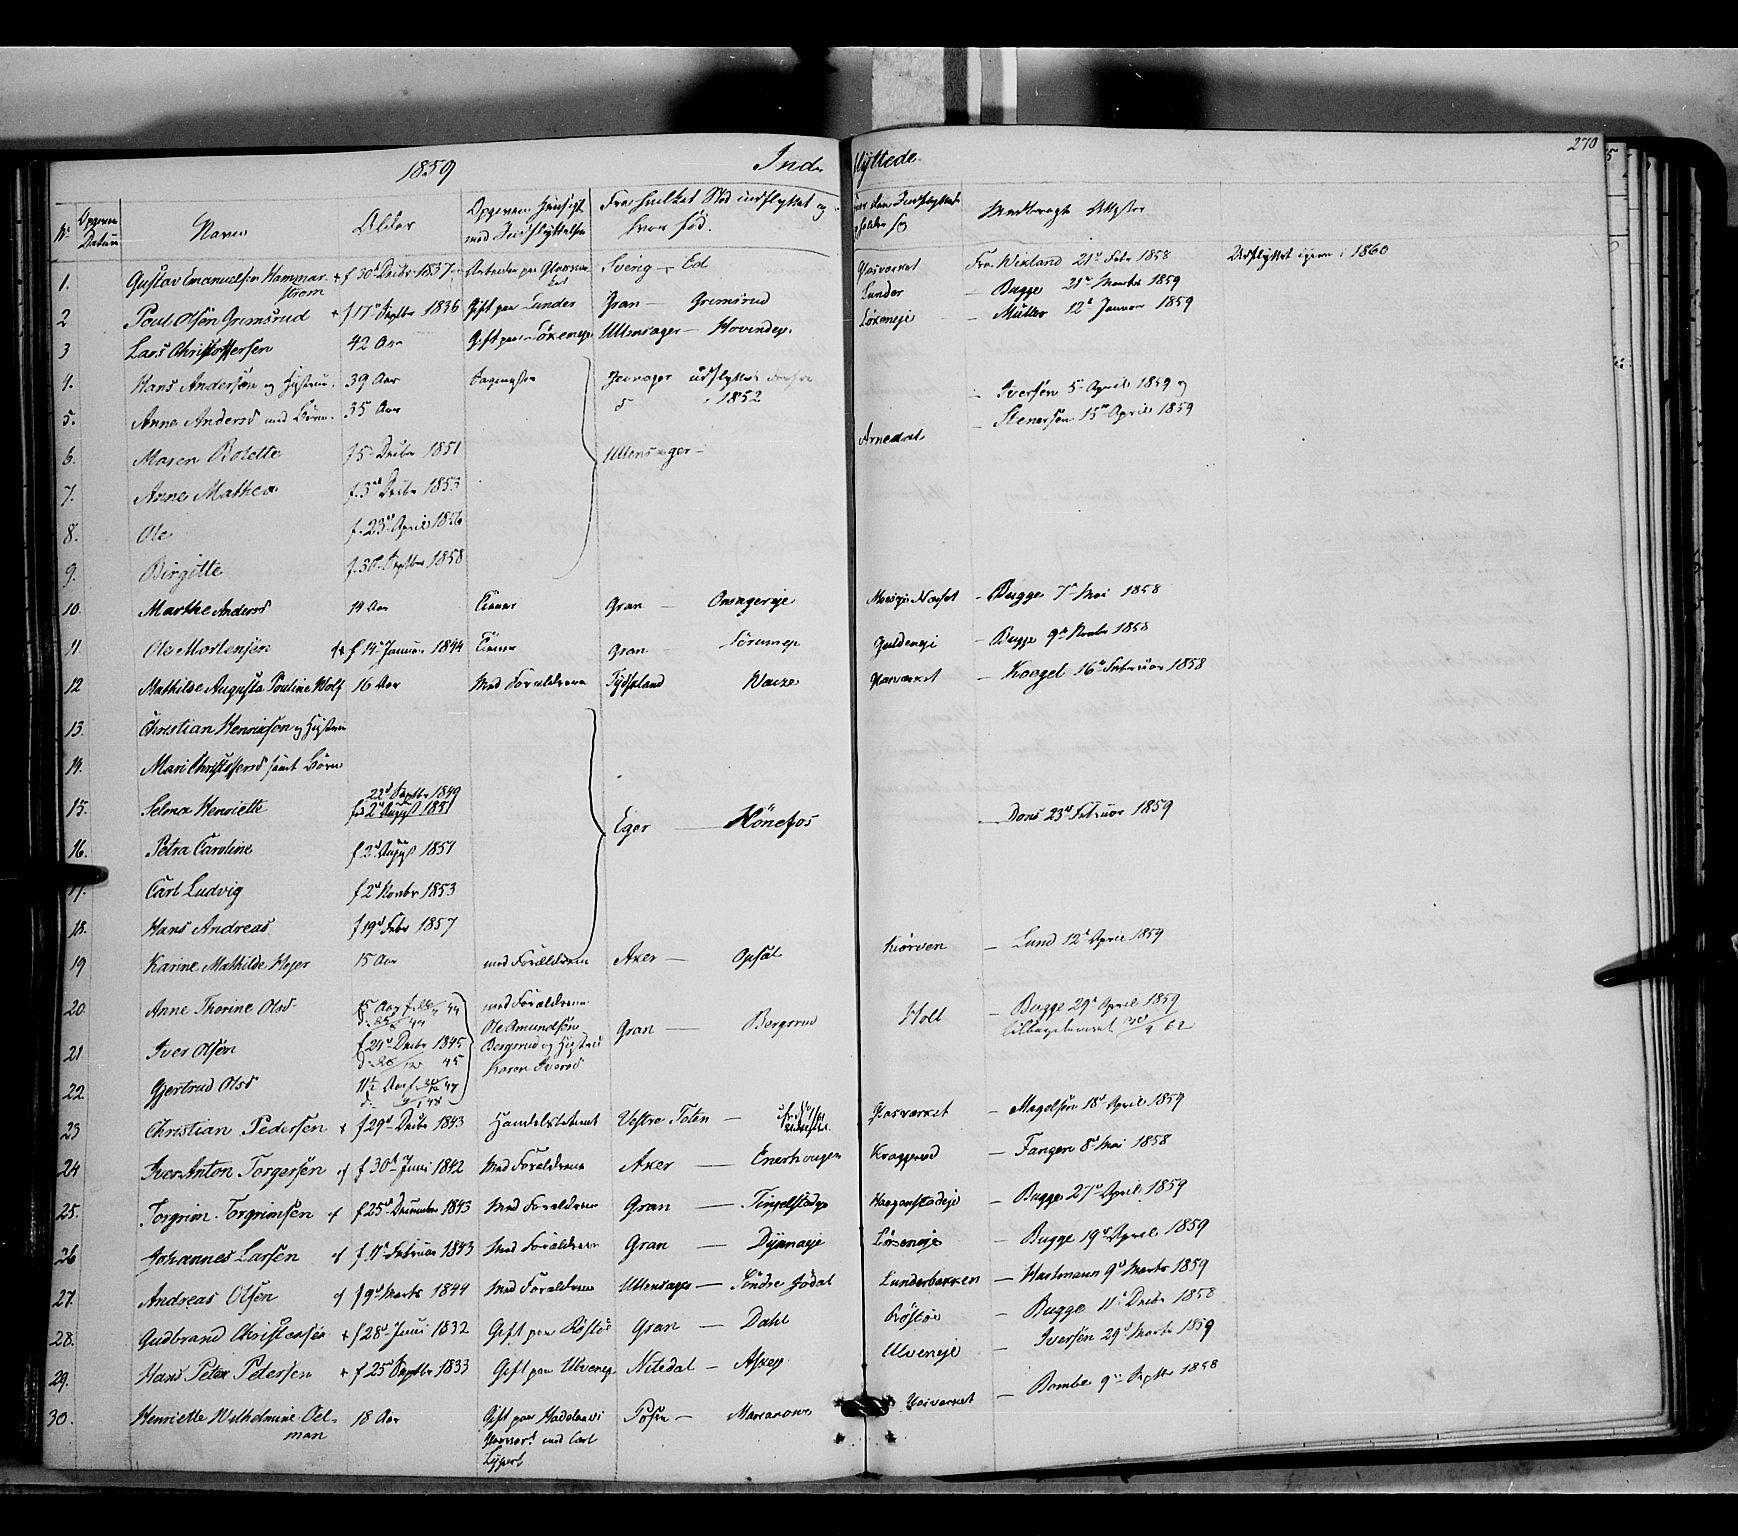 SAH, Jevnaker prestekontor, Ministerialbok nr. 7, 1858-1876, s. 270